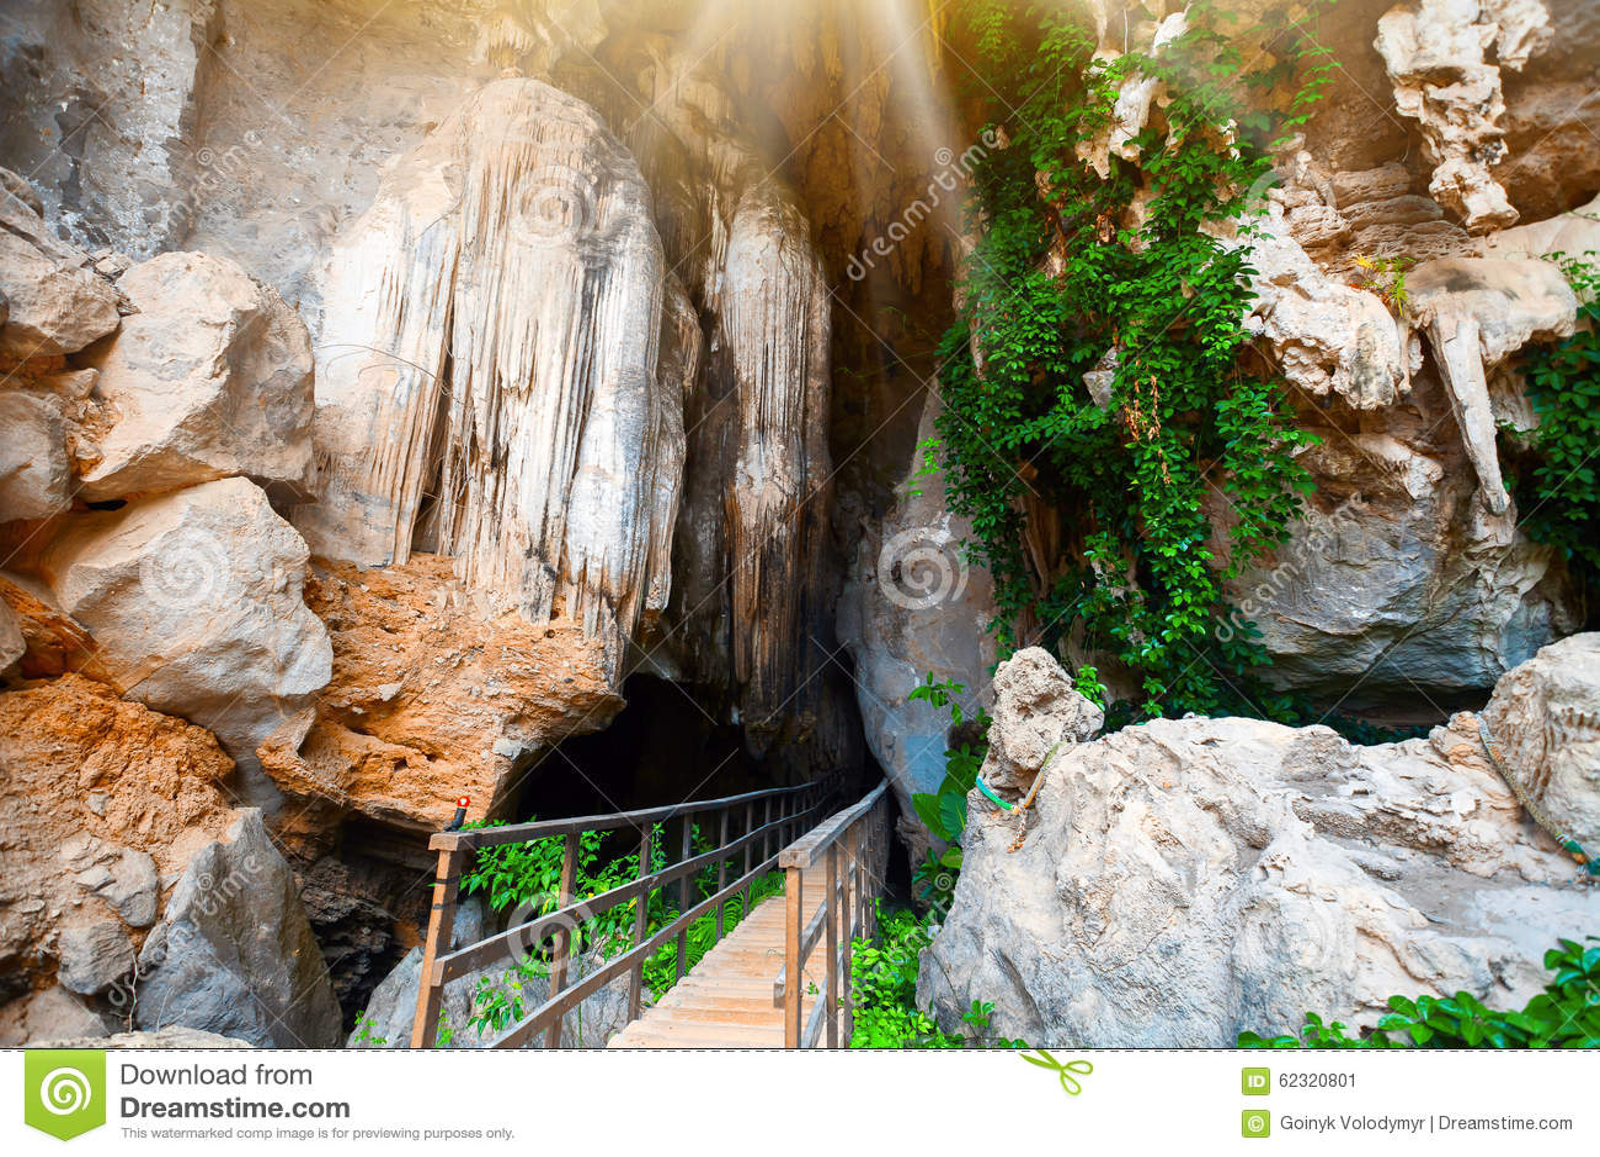 Cave stalactites and stalagmites